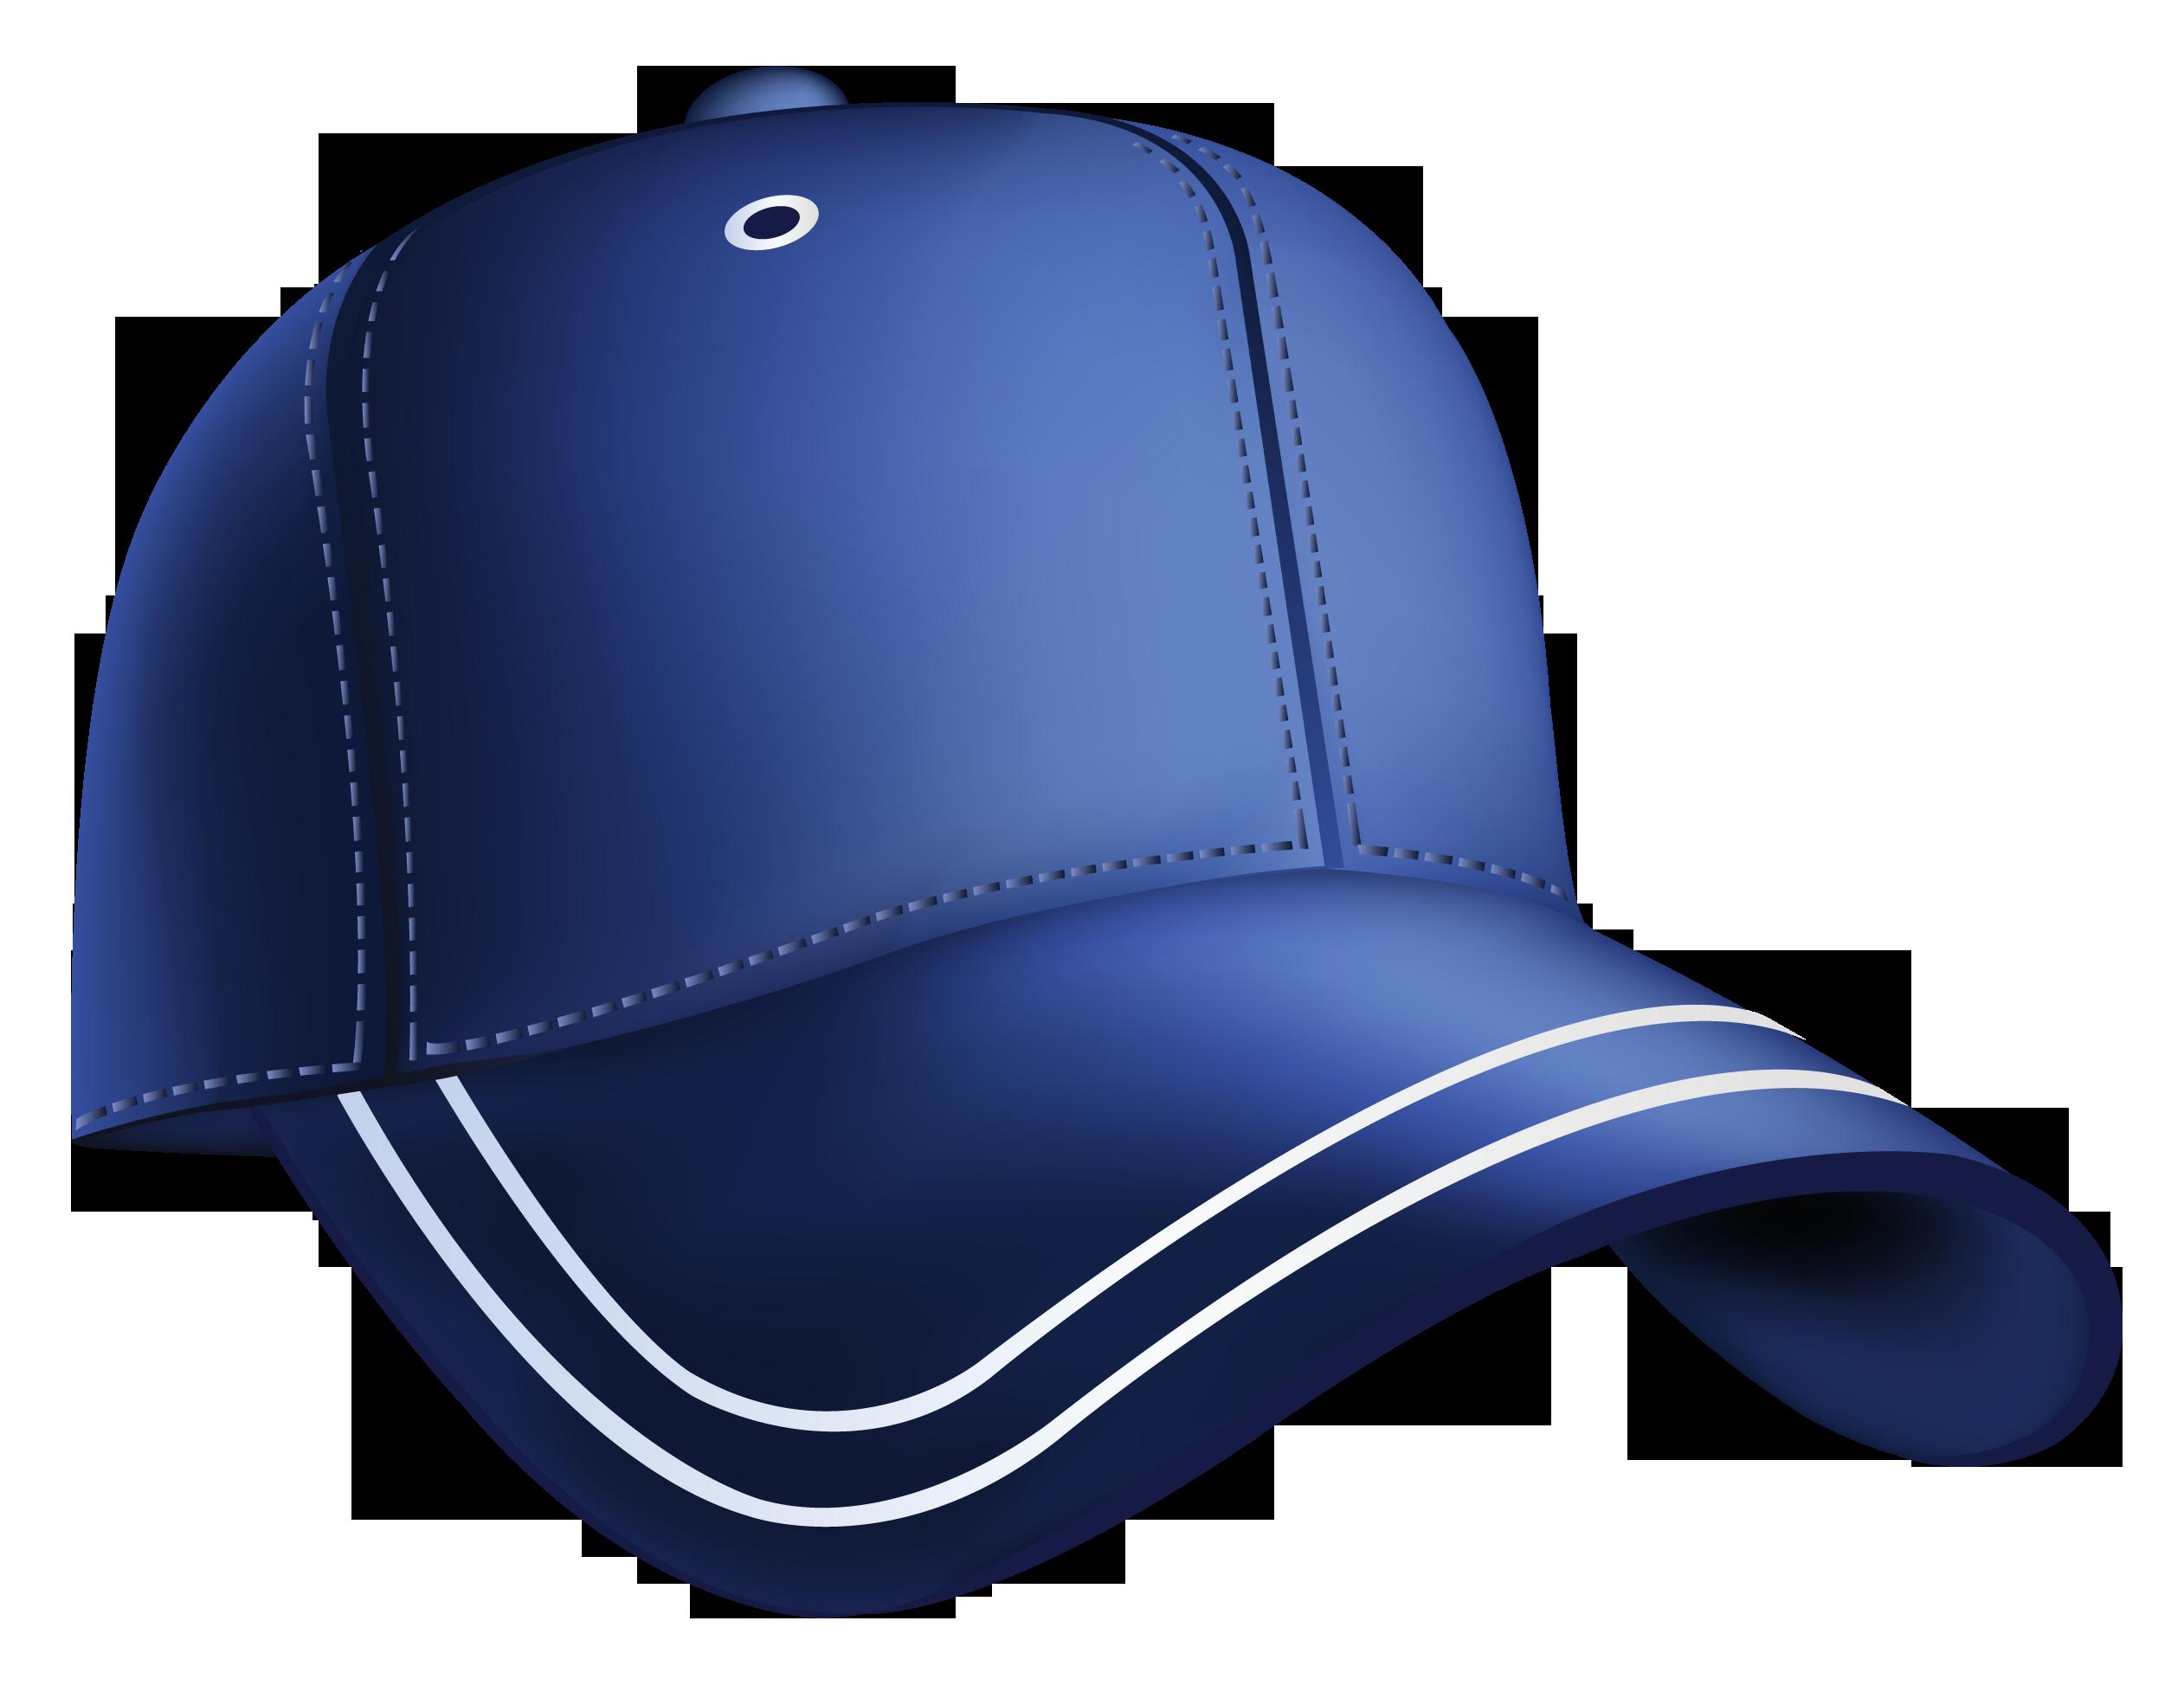 Baseball Cap Png Image Free Download Cap Clip Art Baseball Cap